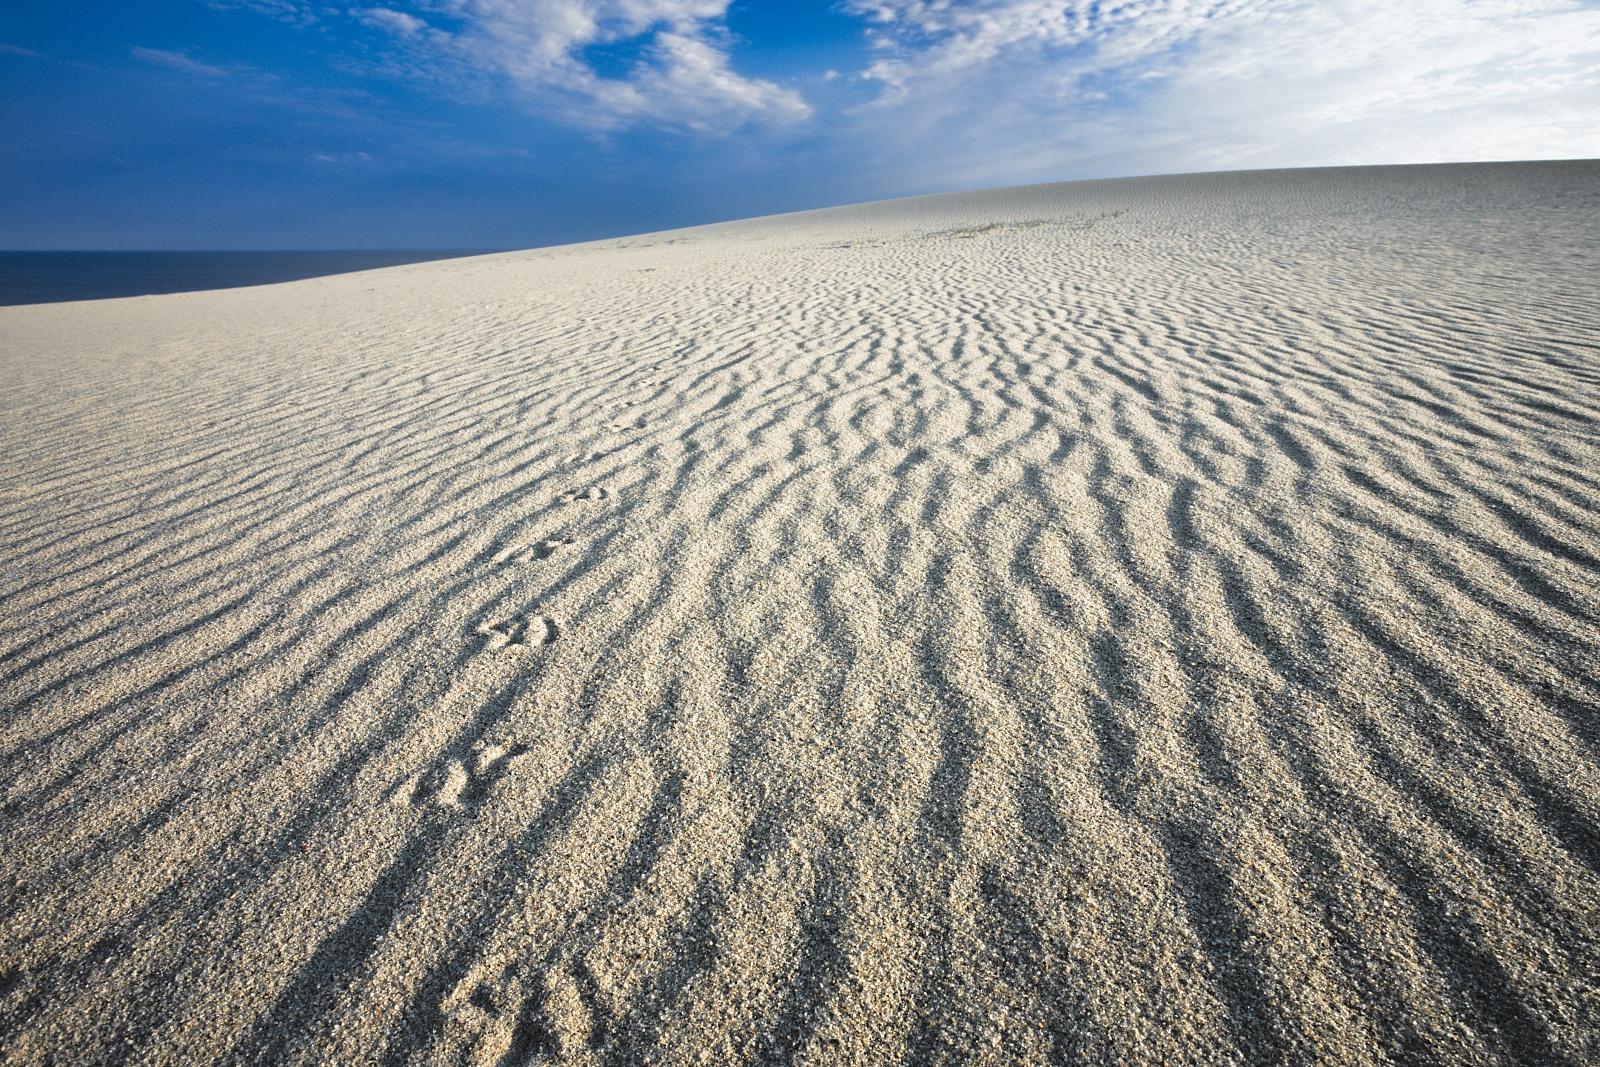 Birds footprints on a dune